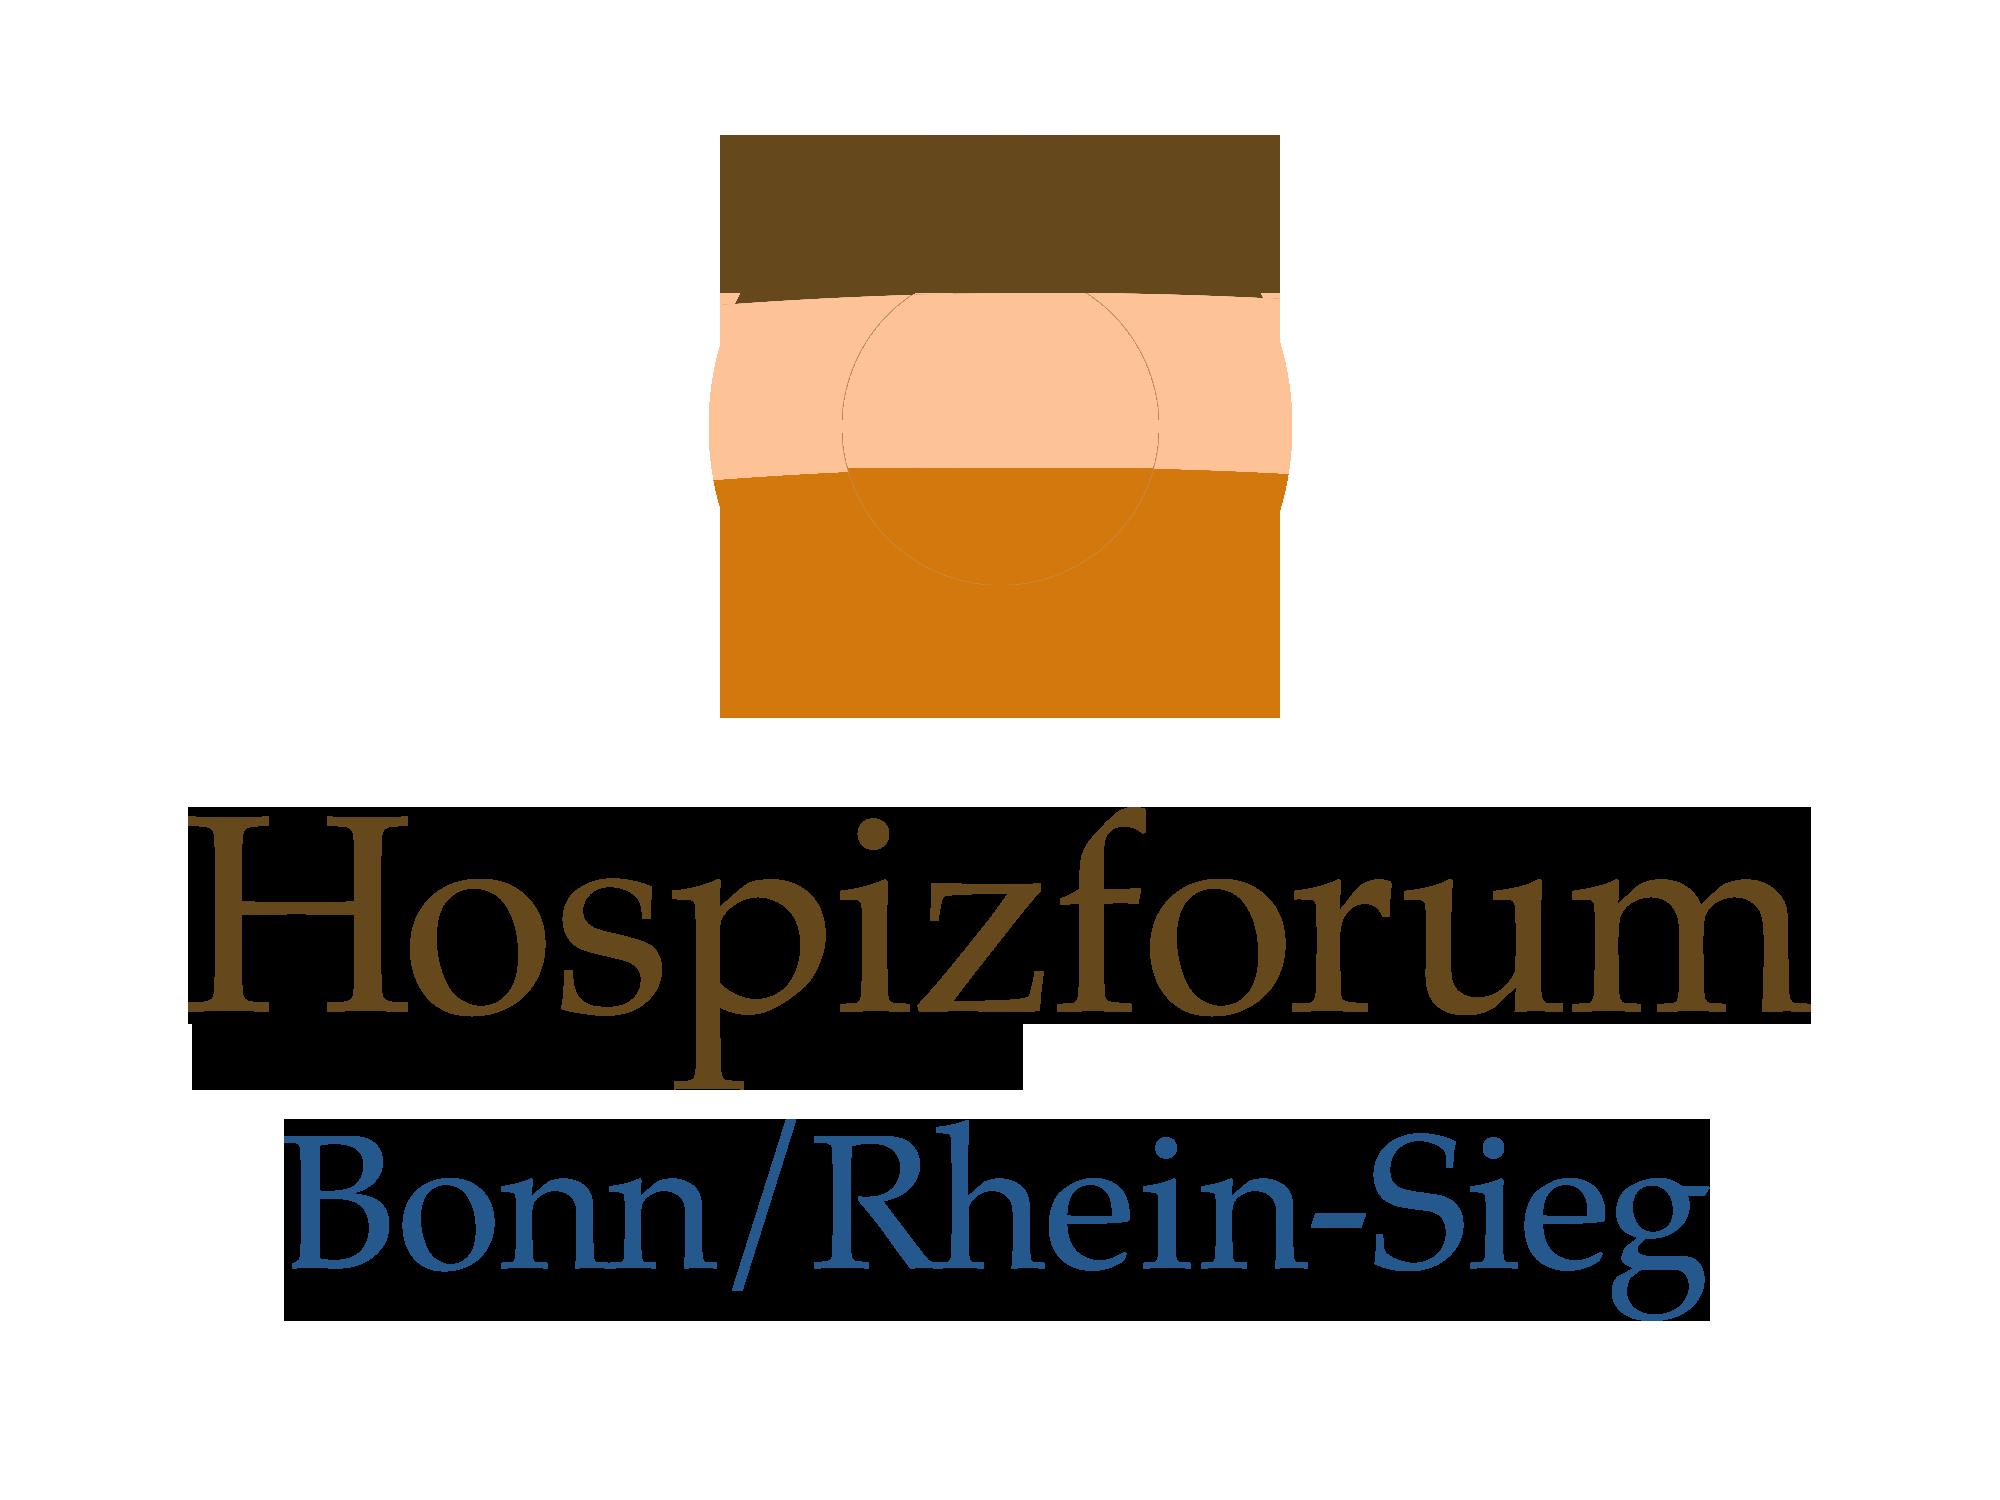 Hospizforum Bonn/Rhein-Sieg